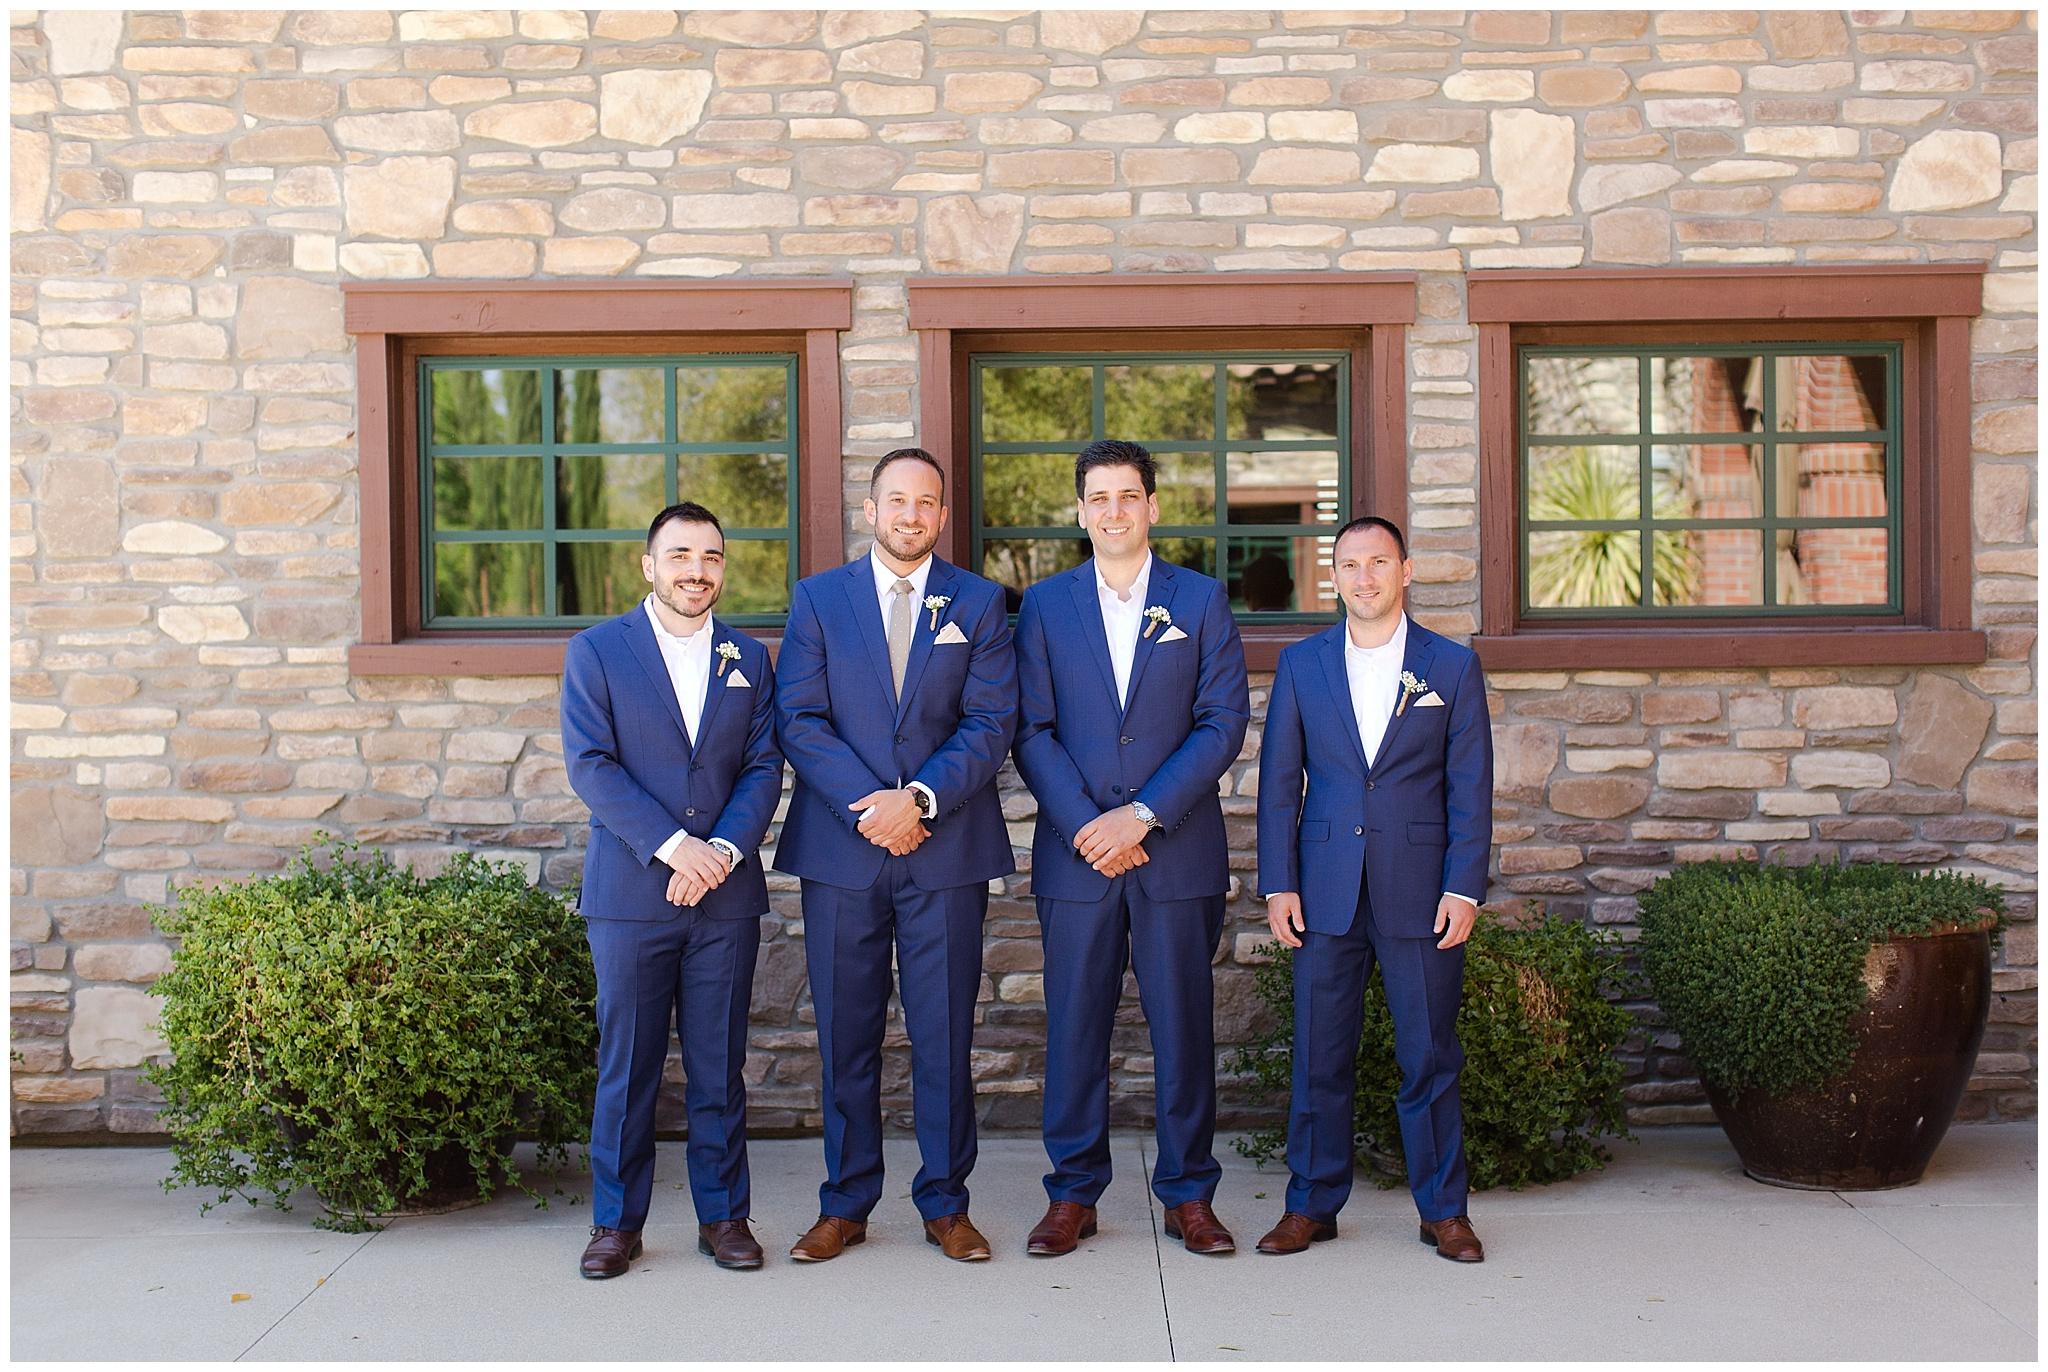 Vinny & Cayt Wedding 4-26-18-0965.jpg